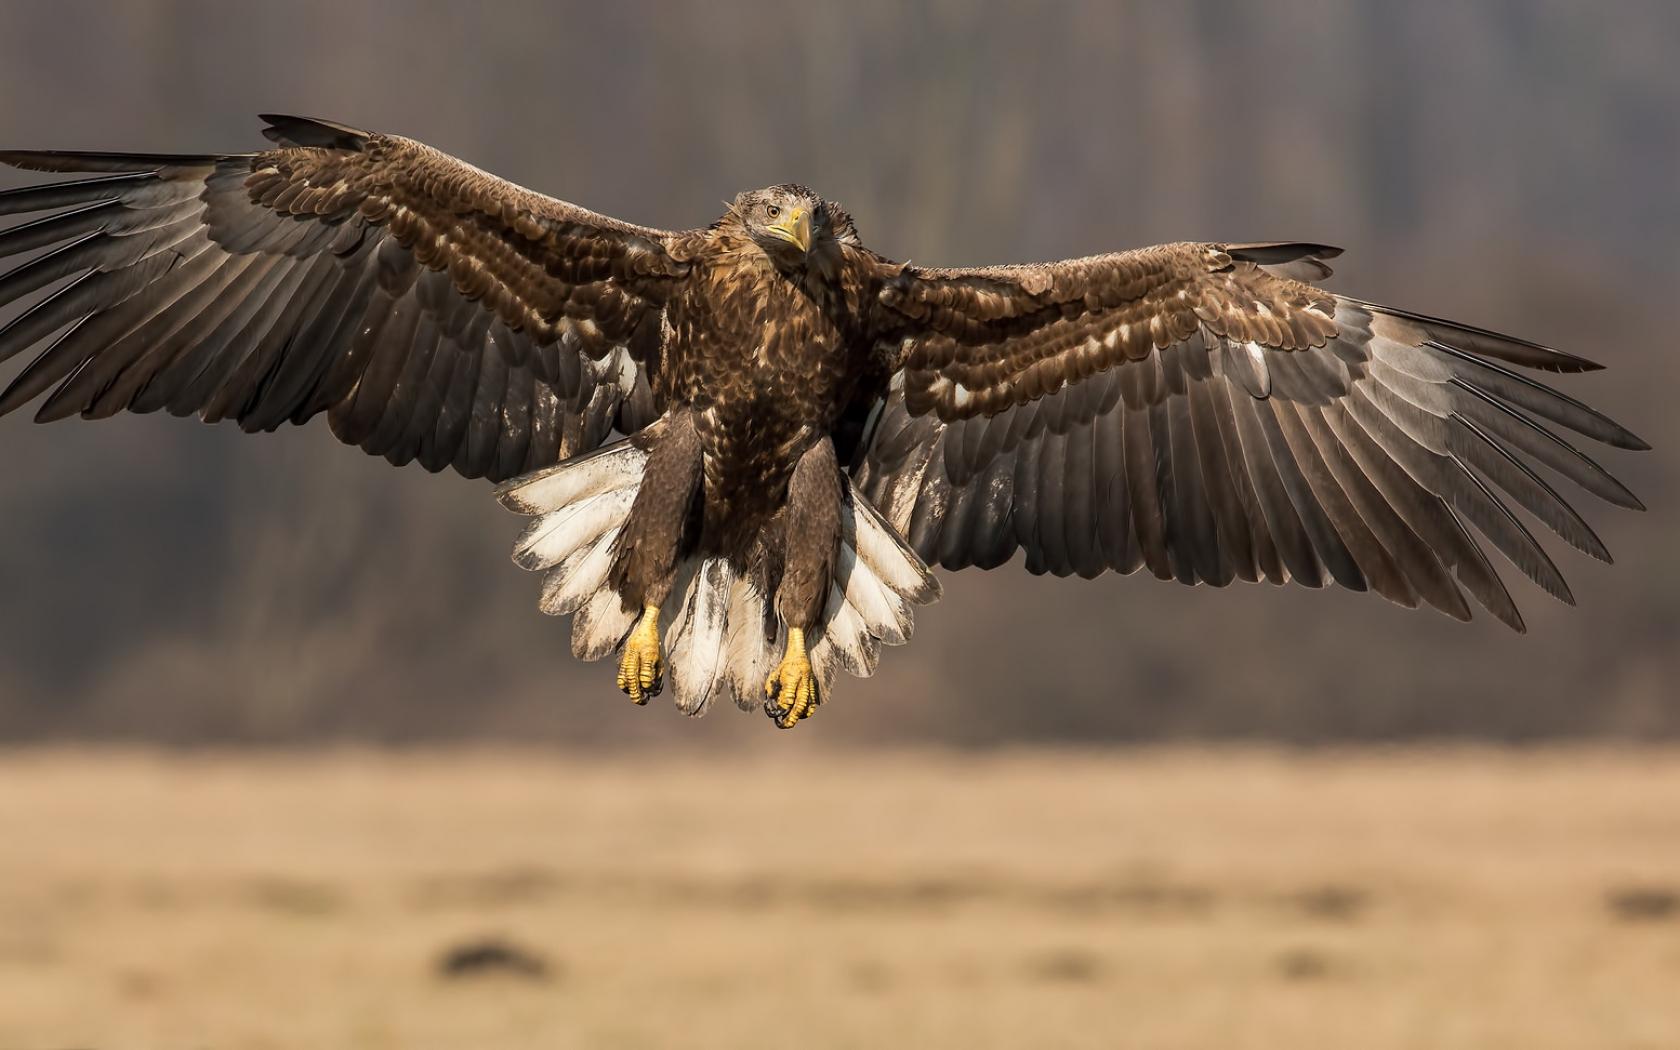 Un águila con las alas extendidas - 1680x1050